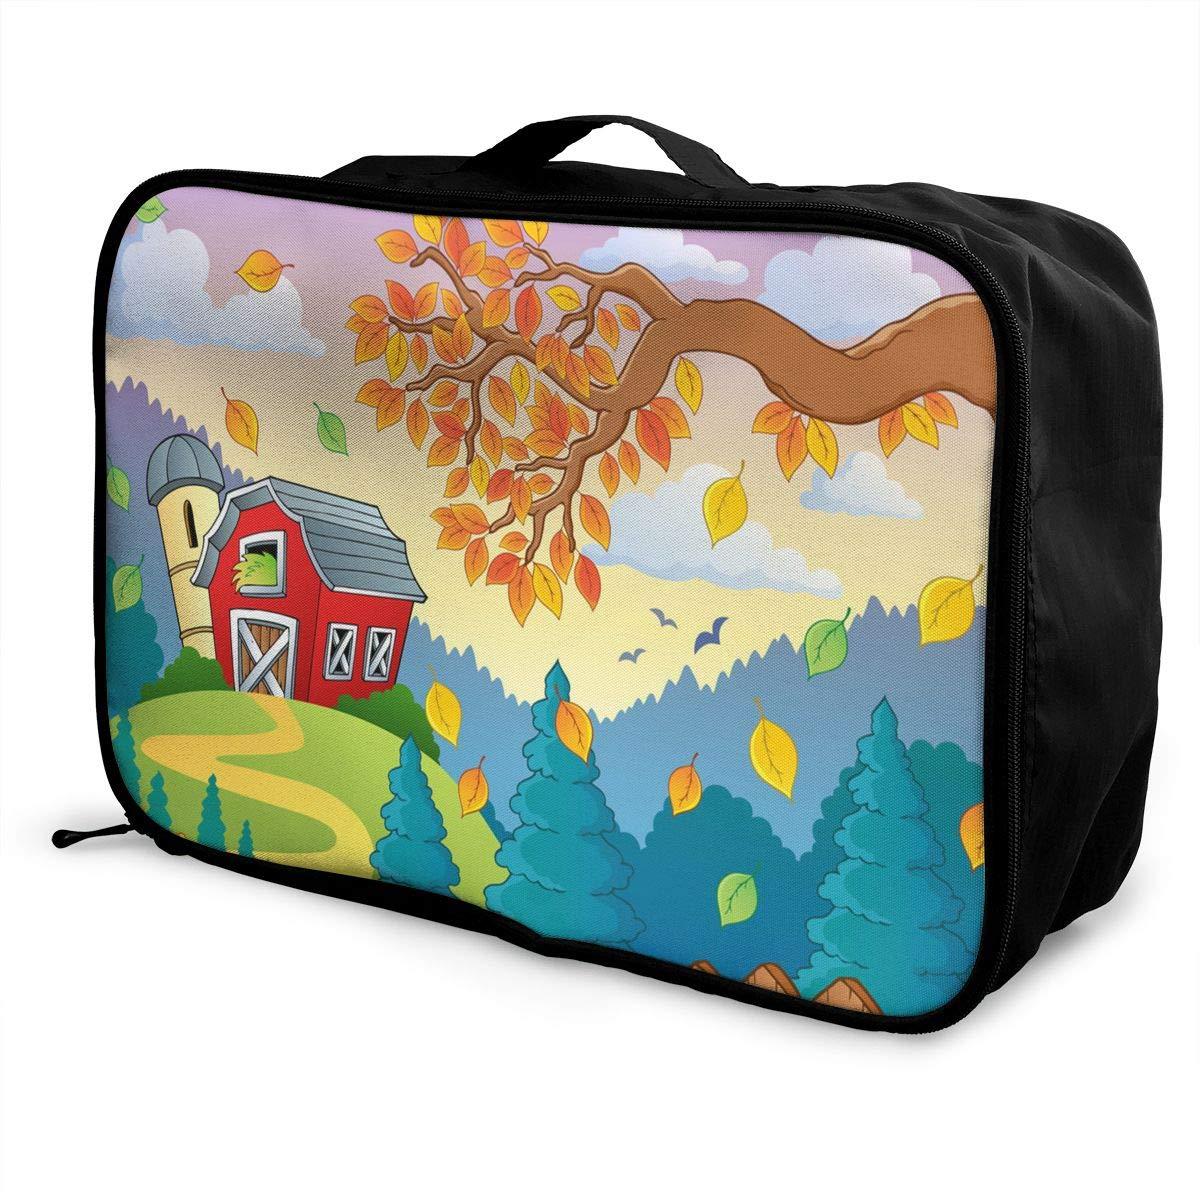 Travel Luggage Duffle Bag Lightweight Portable Handbag Leaf Nature Large Capacity Waterproof Foldable Storage Tote